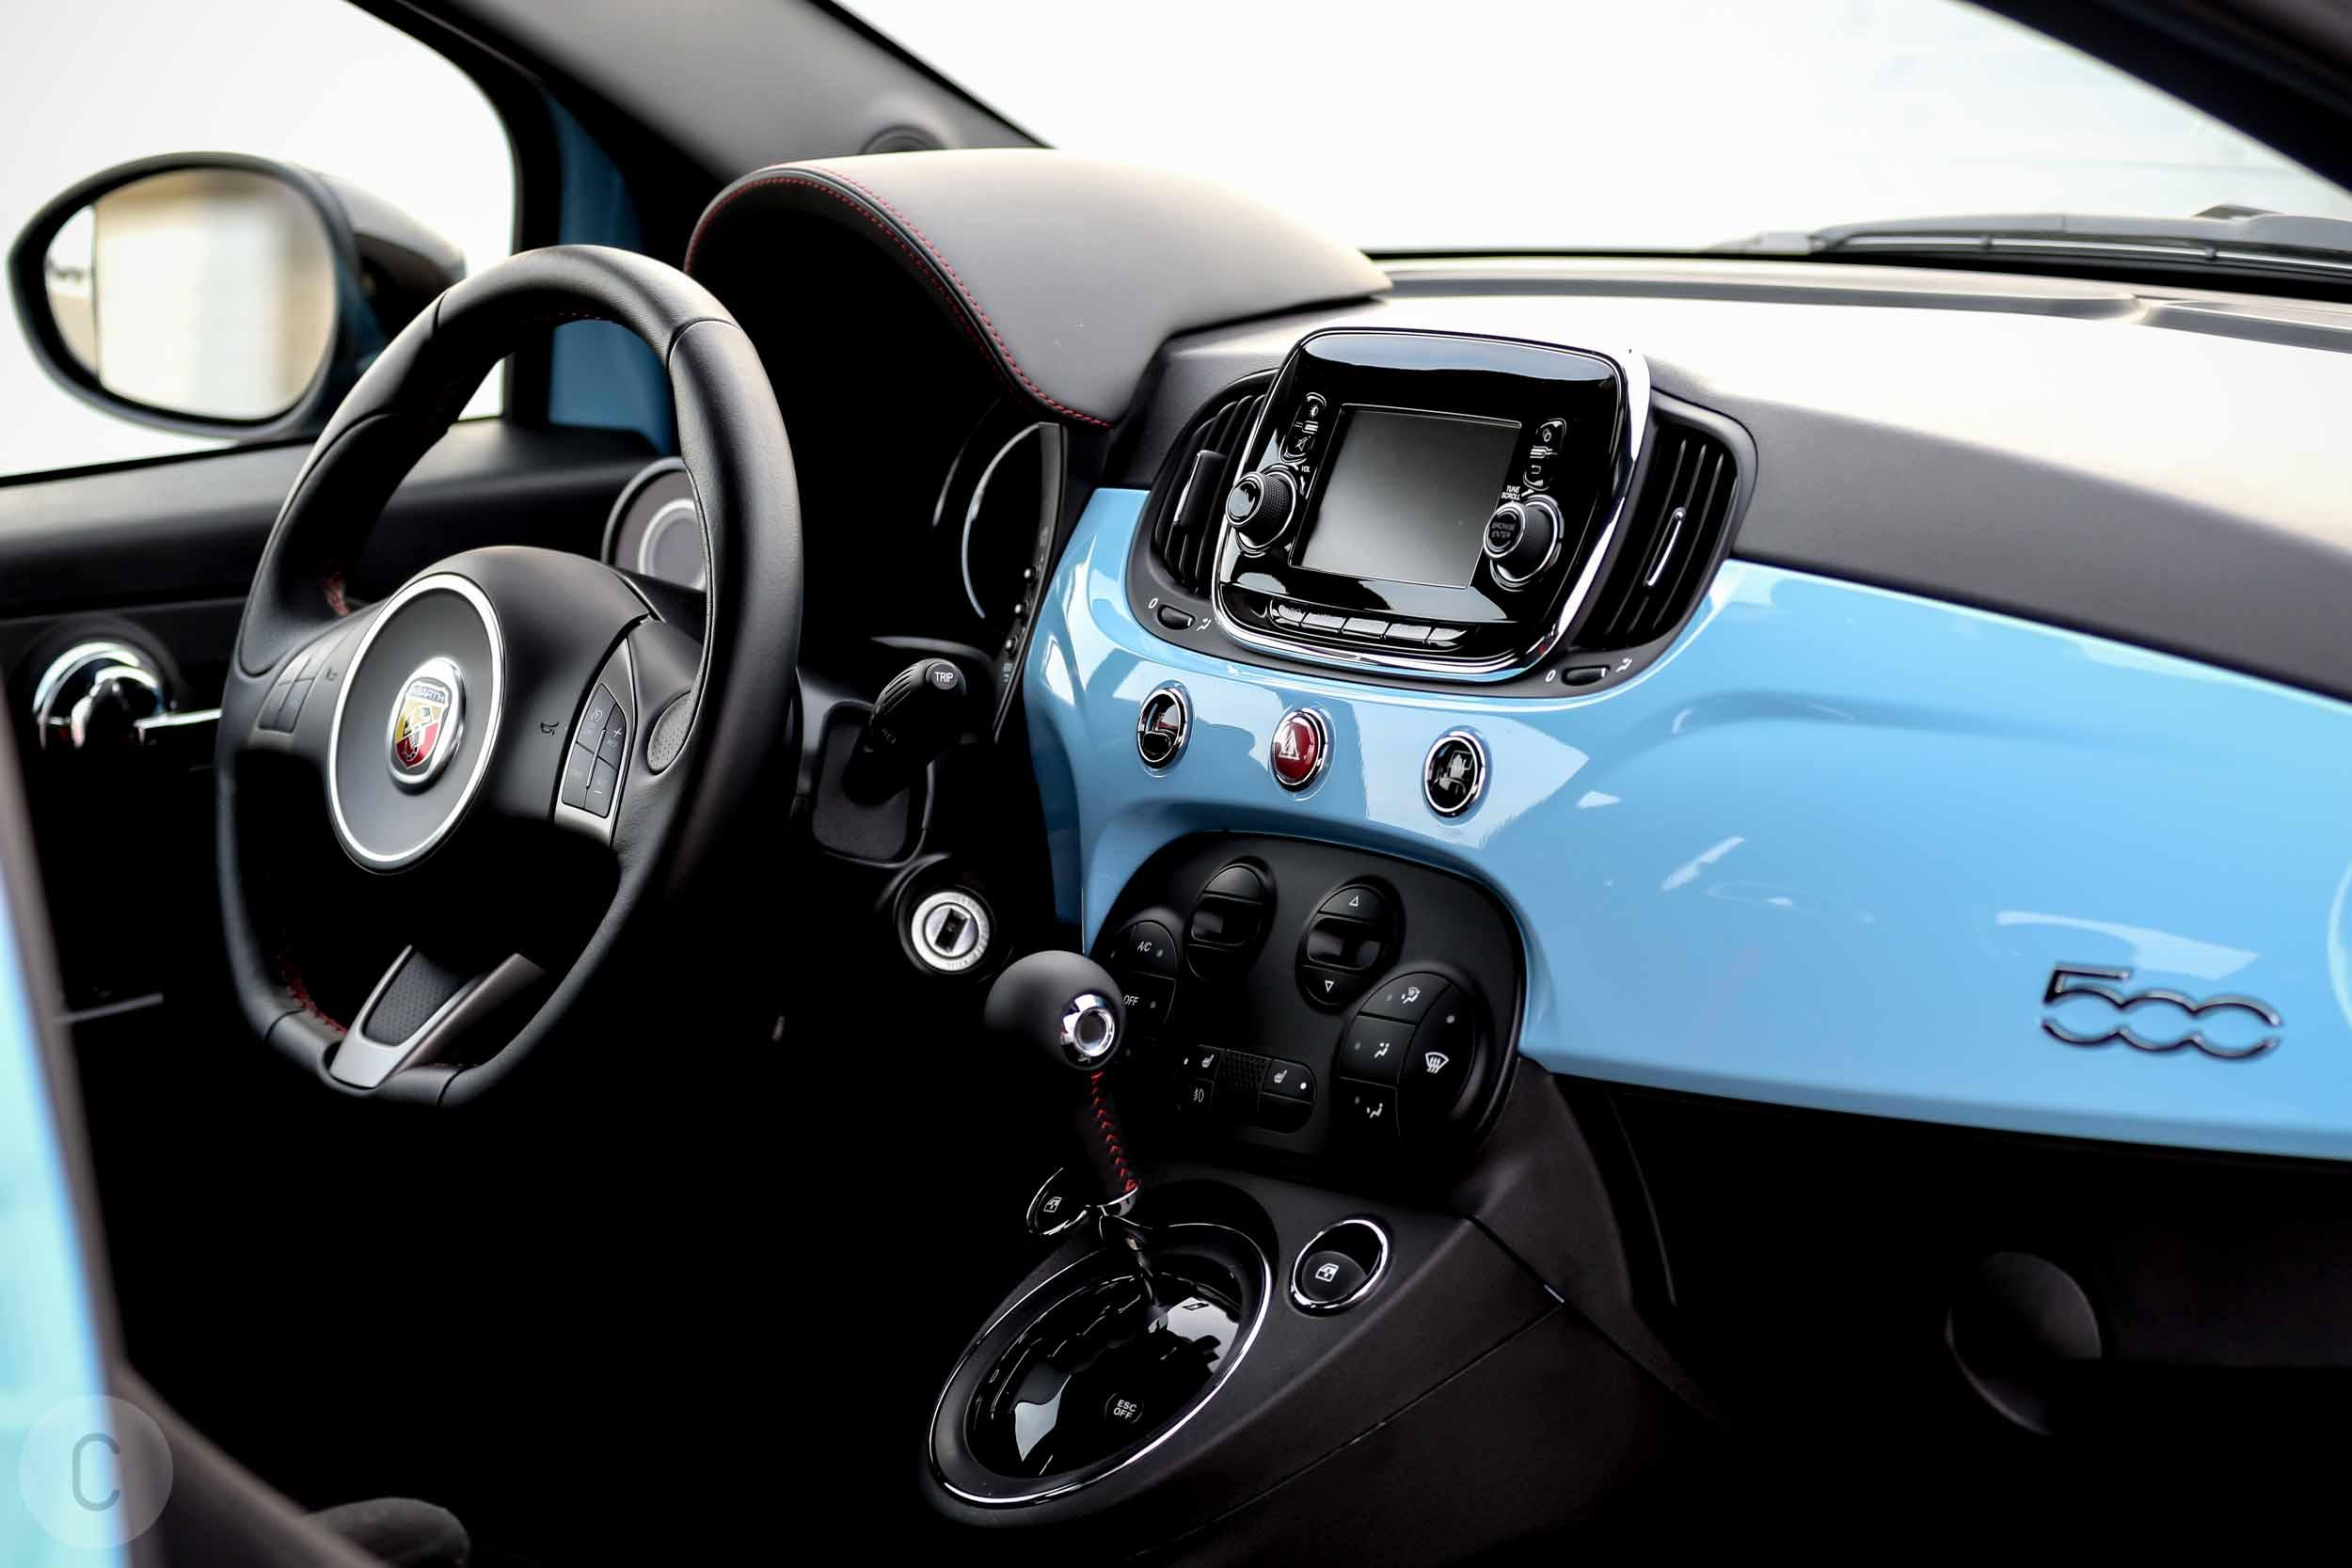 2016 Fiat 500 Abarth • Carfanatics Blog